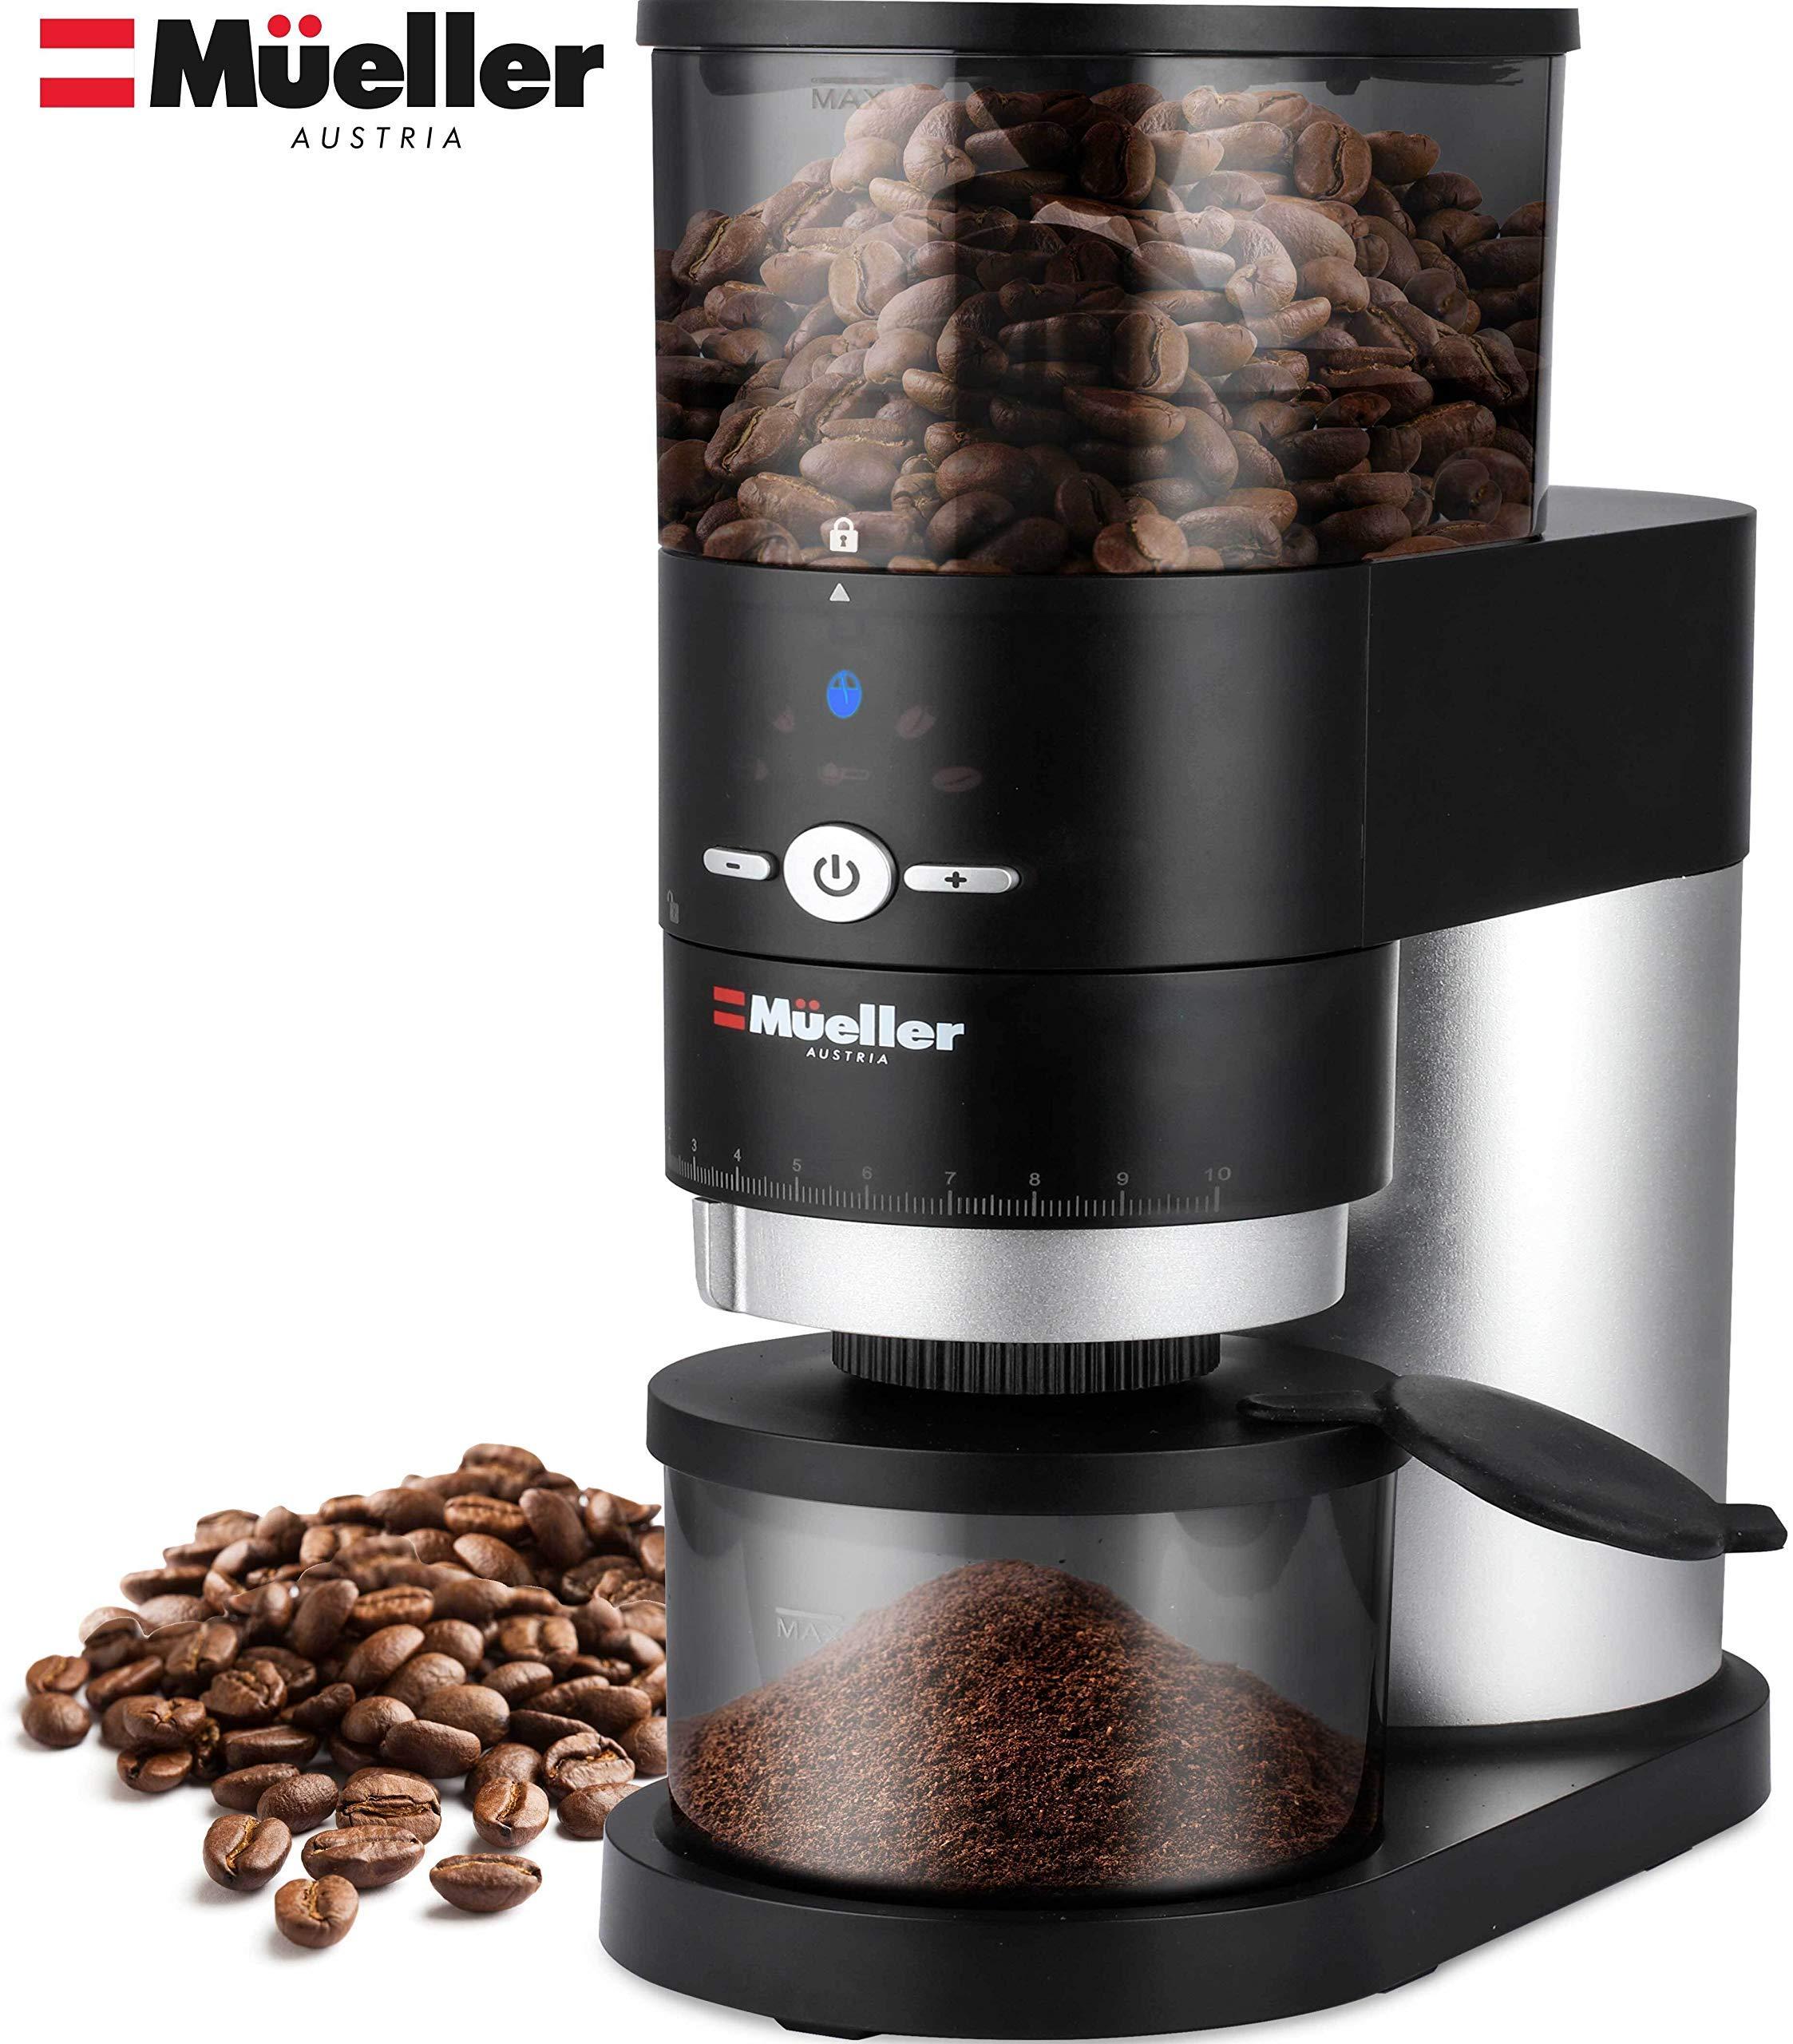 Mueller Coffee Grinder